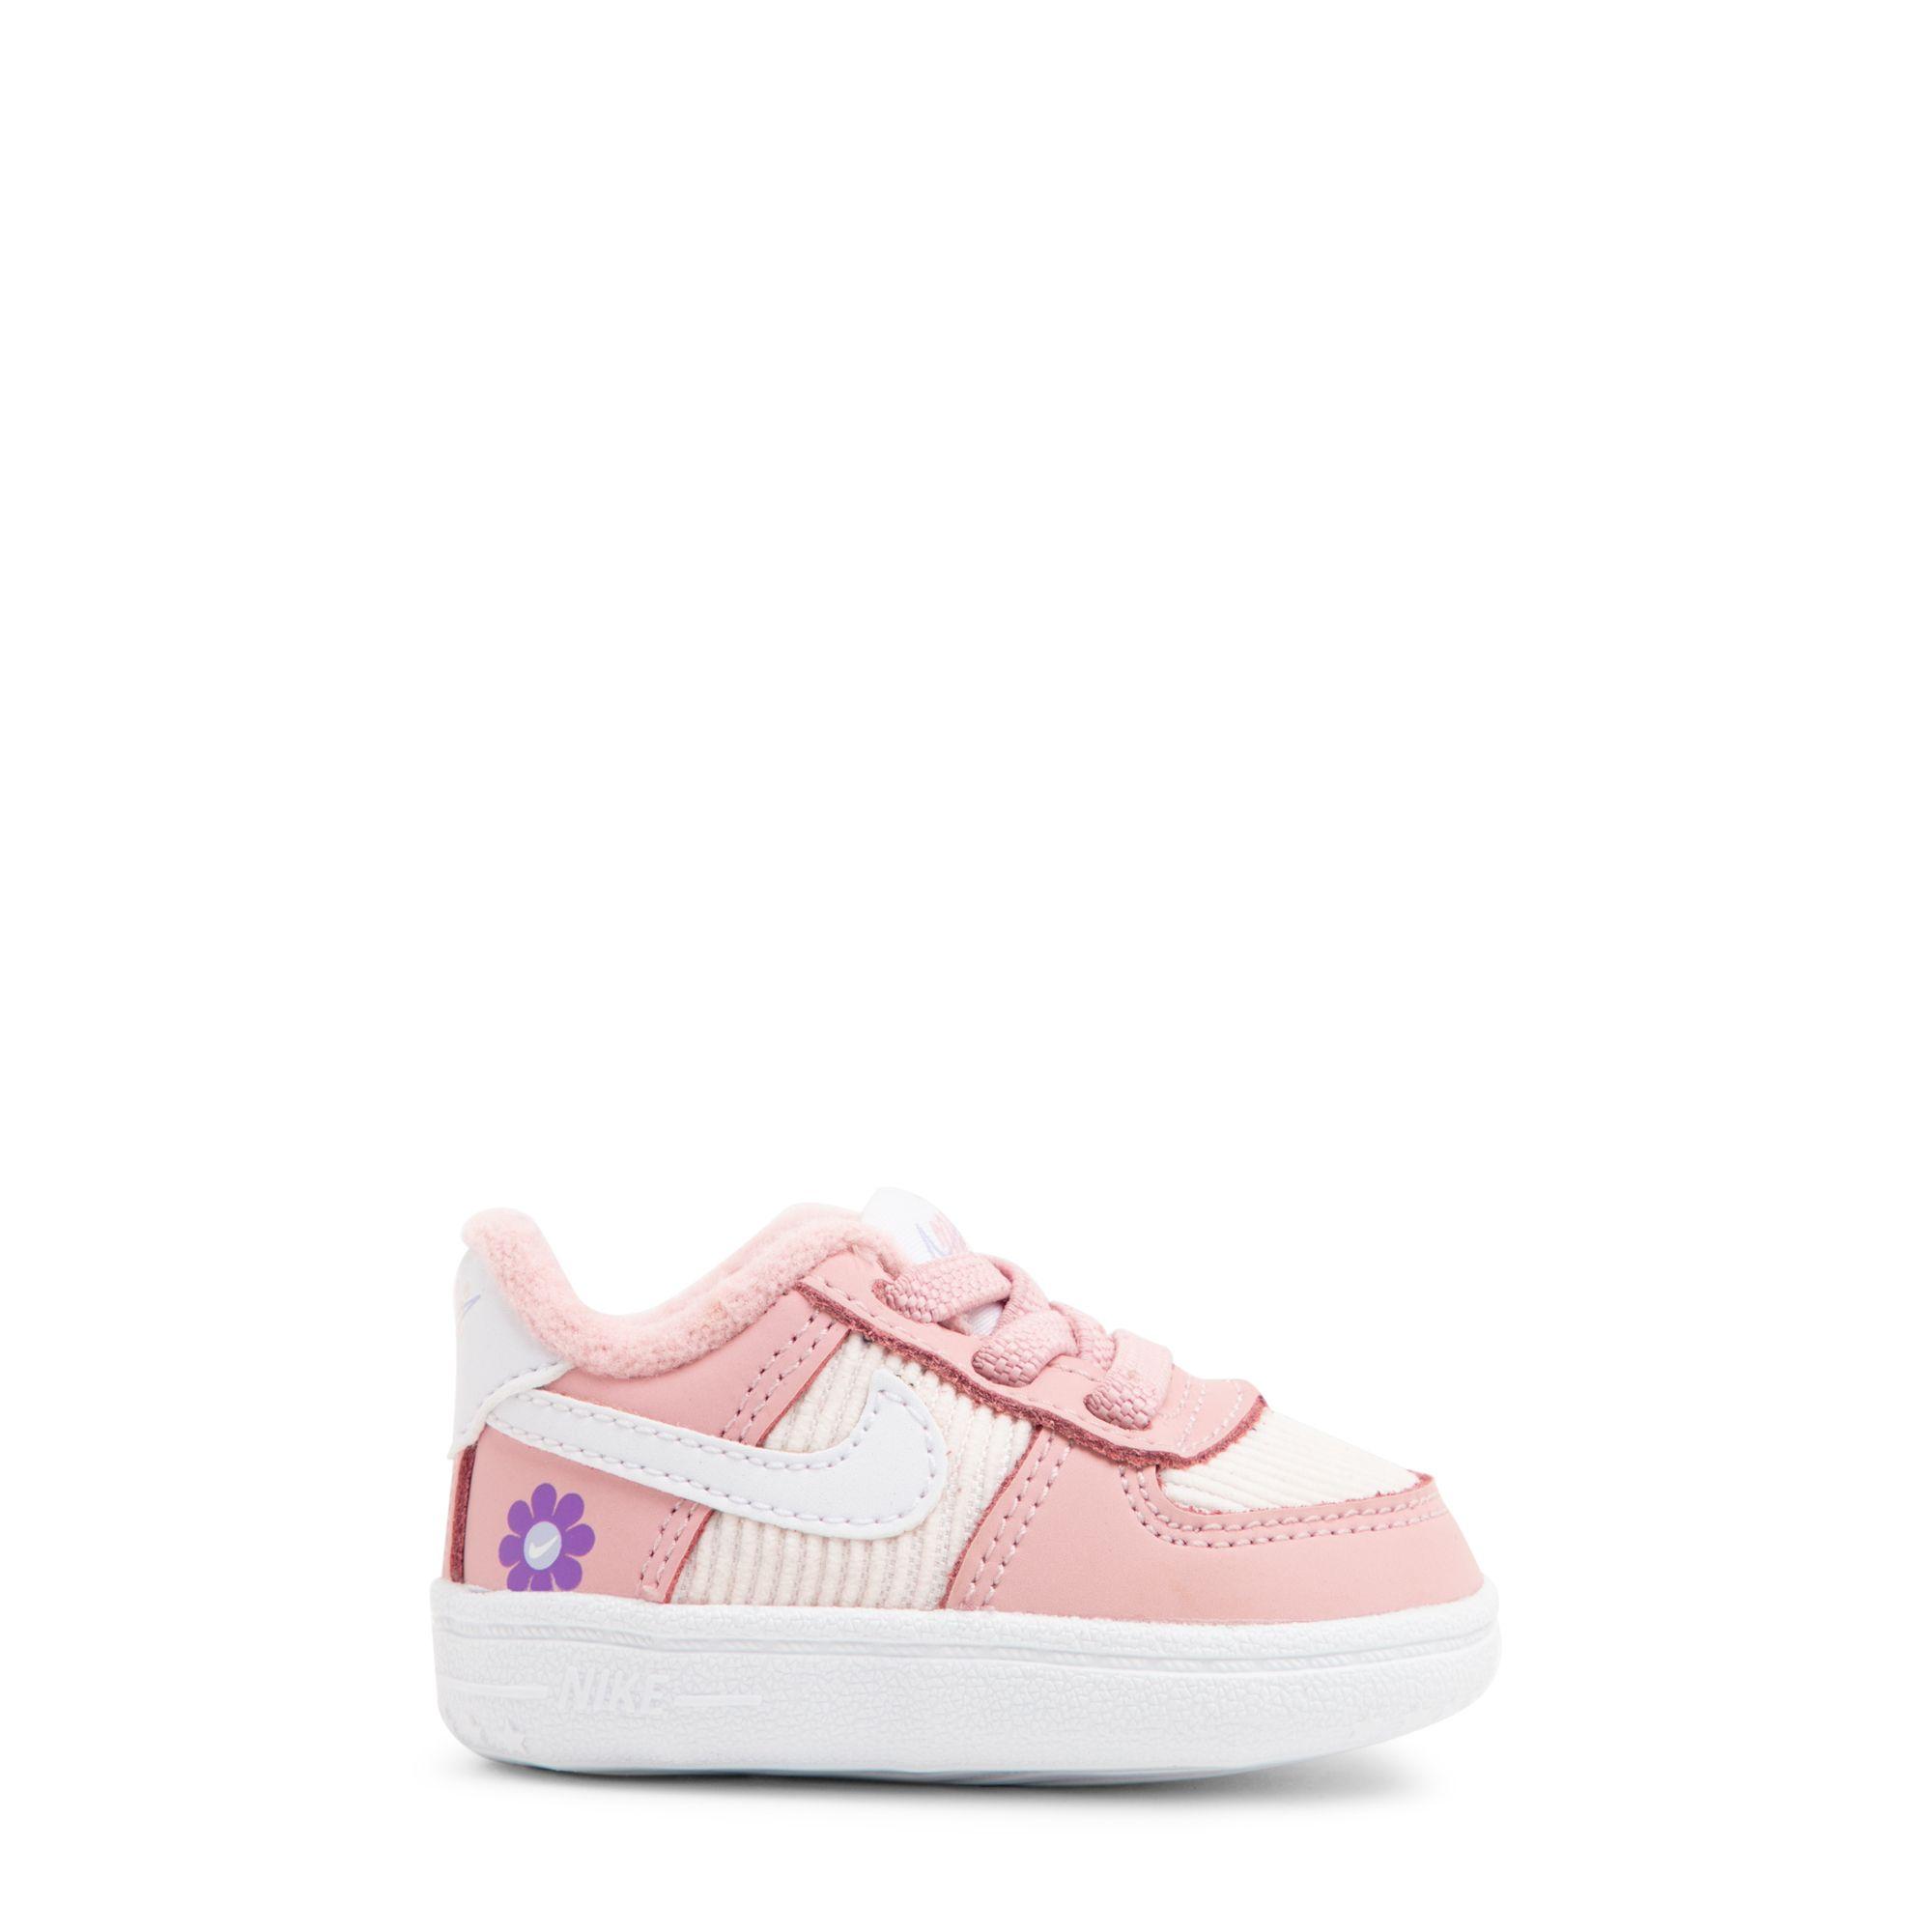 Force 1 SE crib shoes